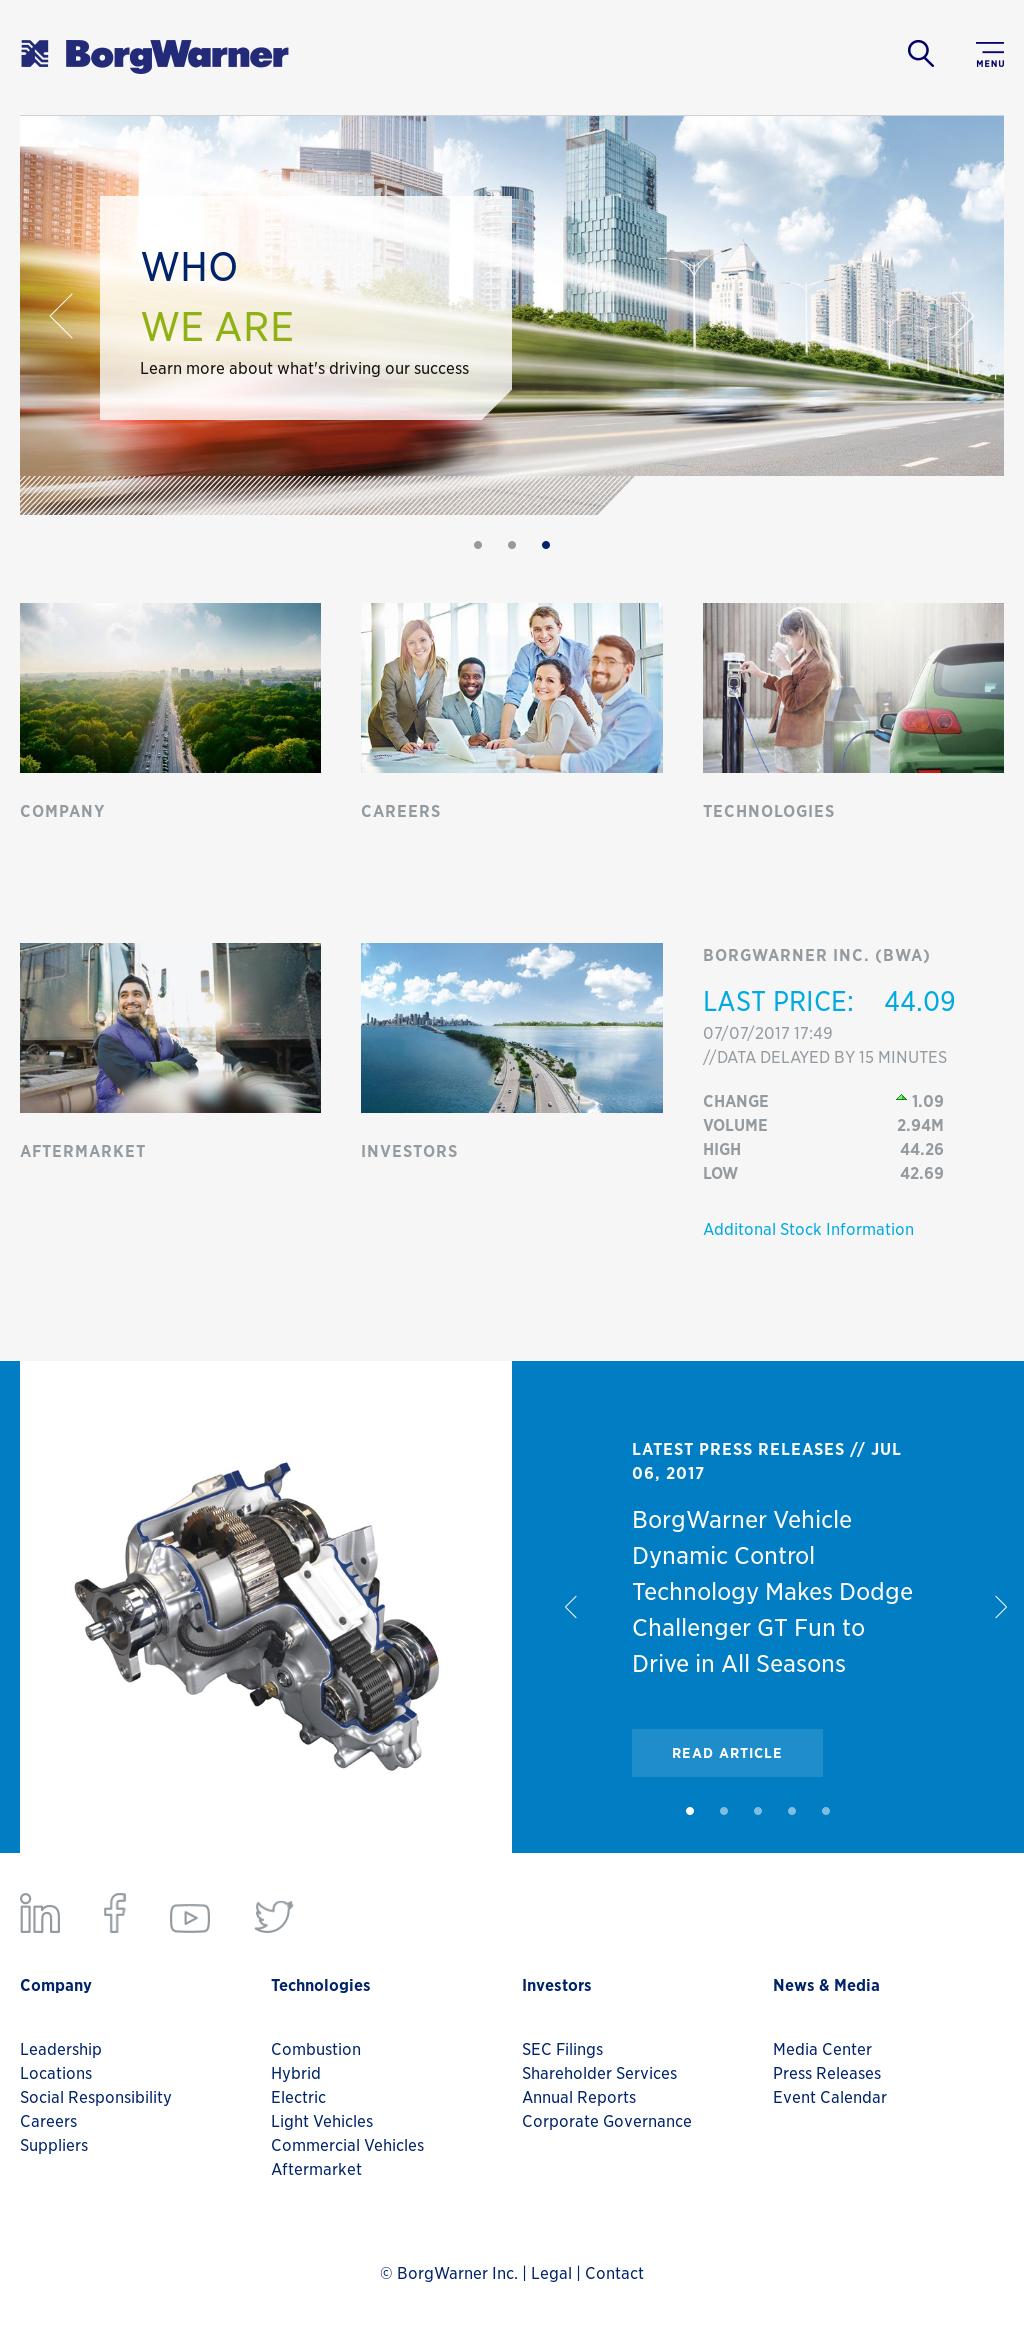 Borgwarner Competitors, Revenue and Employees - Owler Company Profile